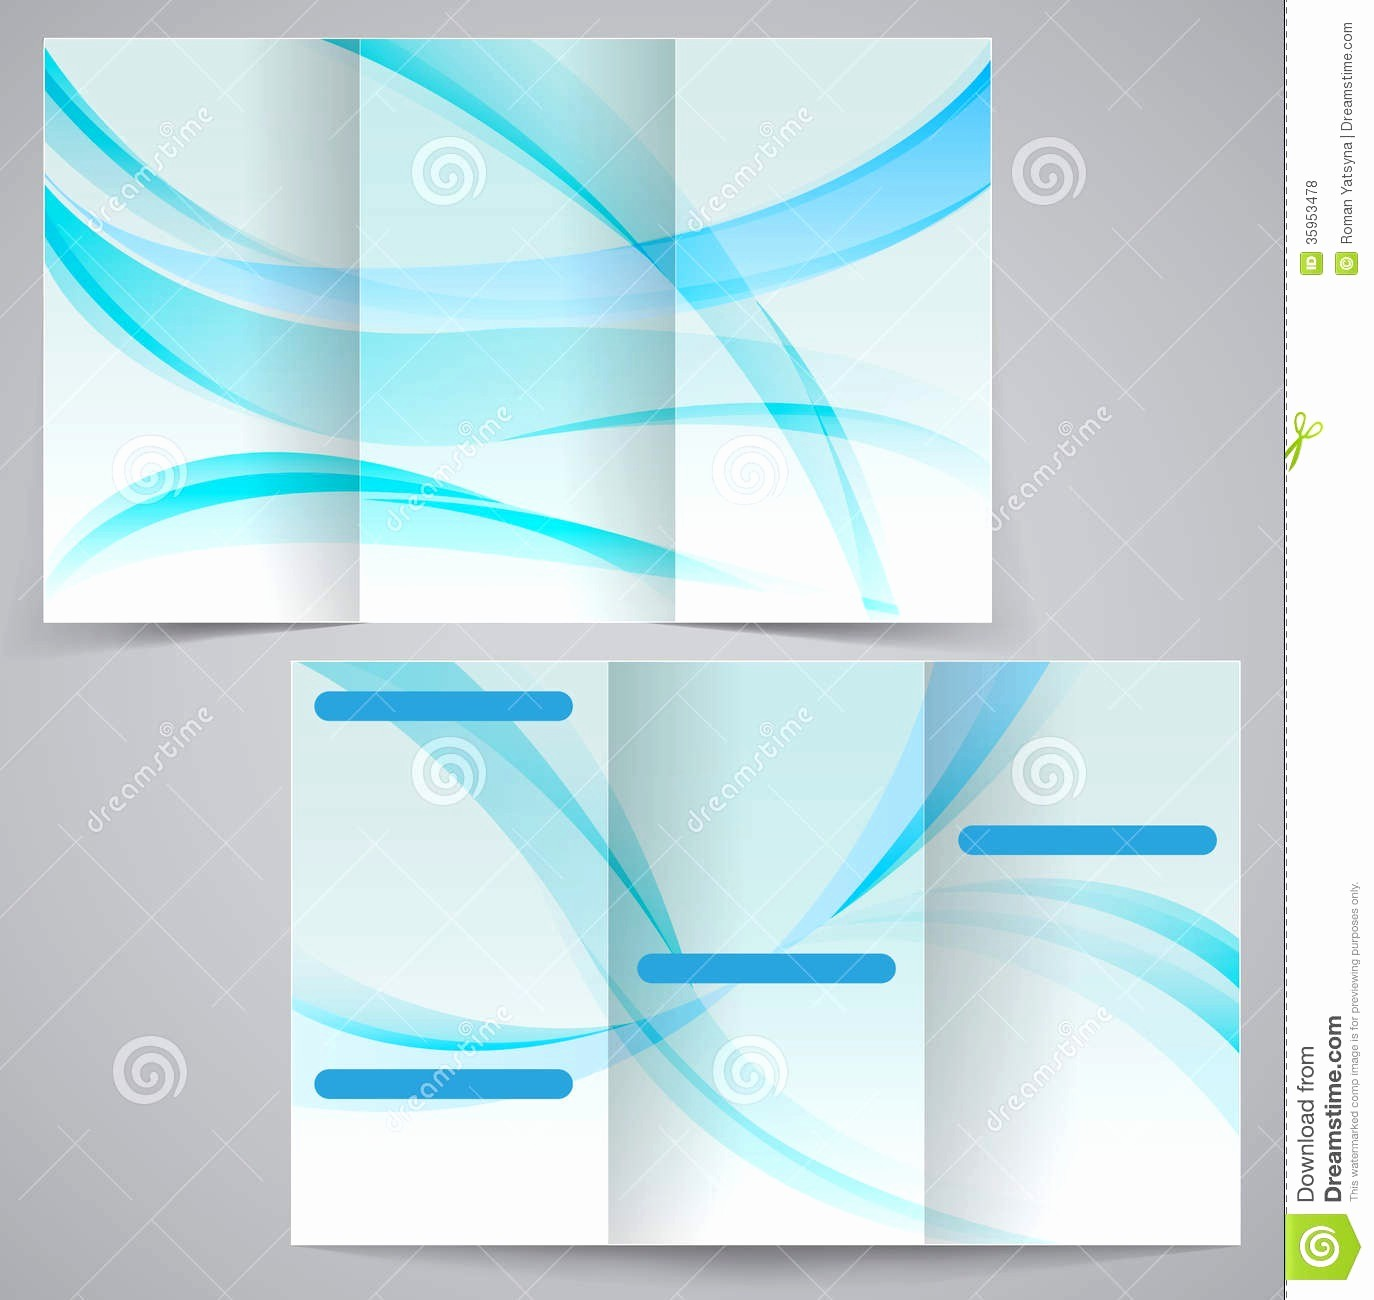 Microsoft Tri Fold Brochure Template Inspirational Blank Brochure Template Word Example Mughals